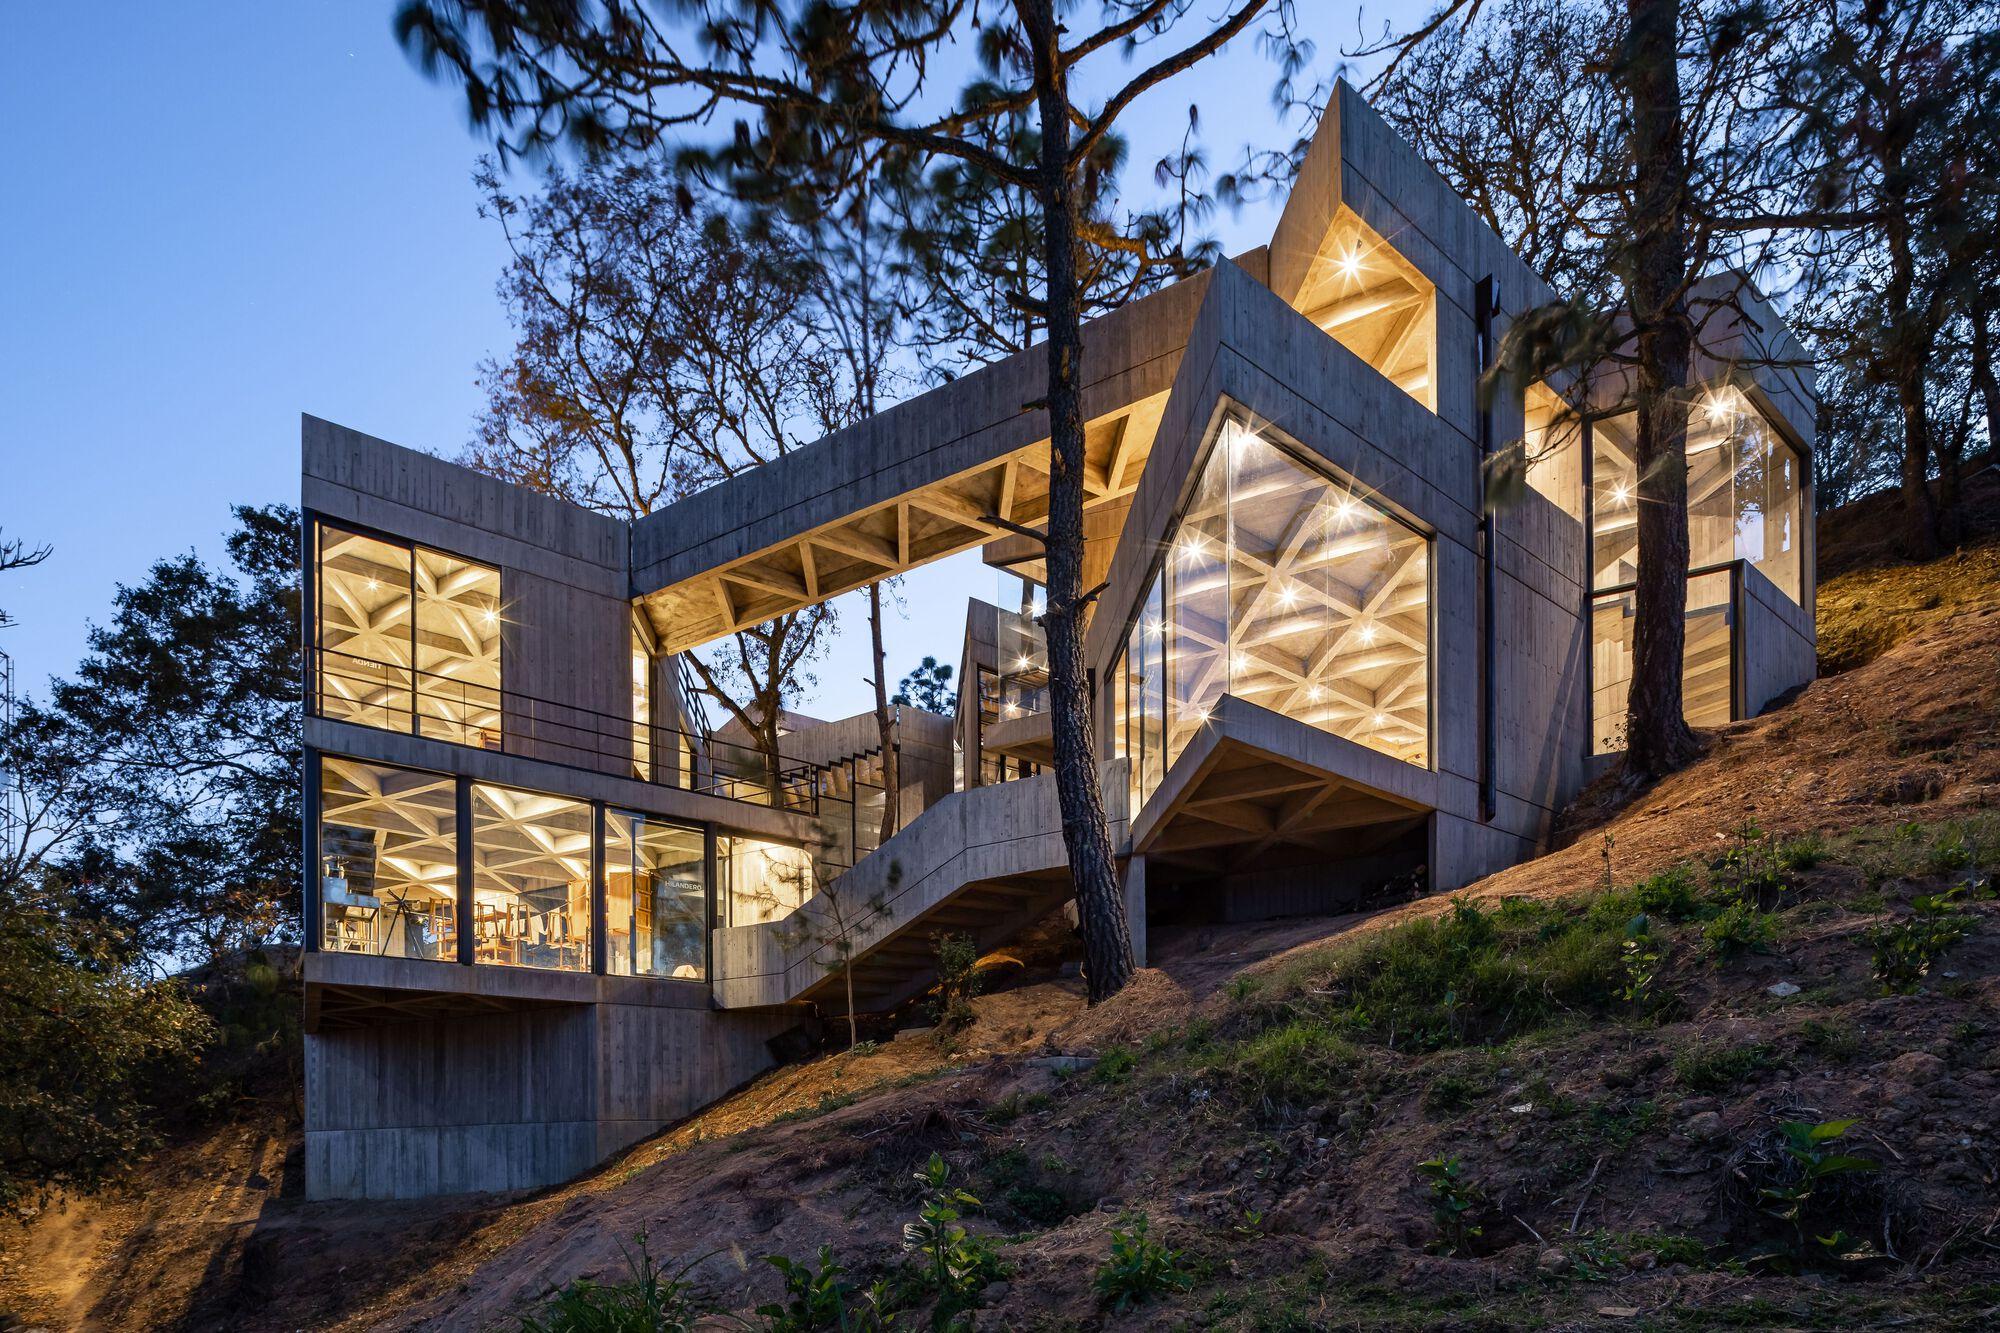 Silkworm Sanctuary / LAMZ Arquitectura